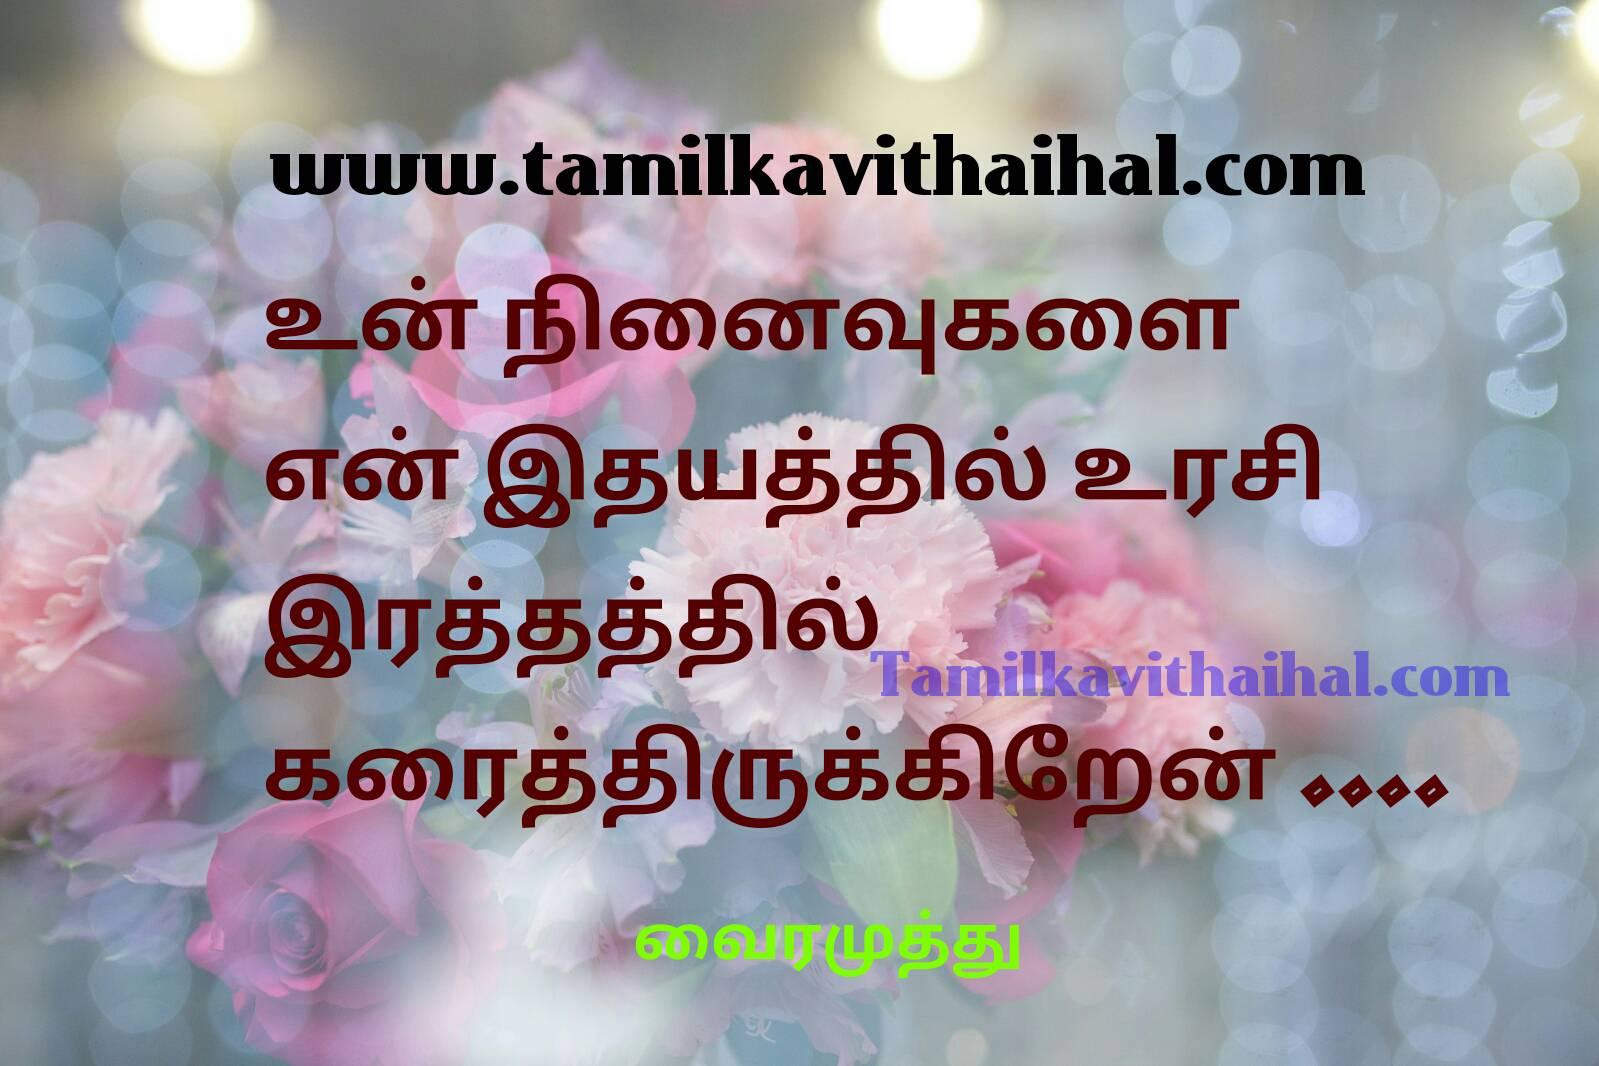 Vairamuthu beautiful kadhal kavithaigal in tamil books love ninaivu blood urasi whatsapp dp hd download